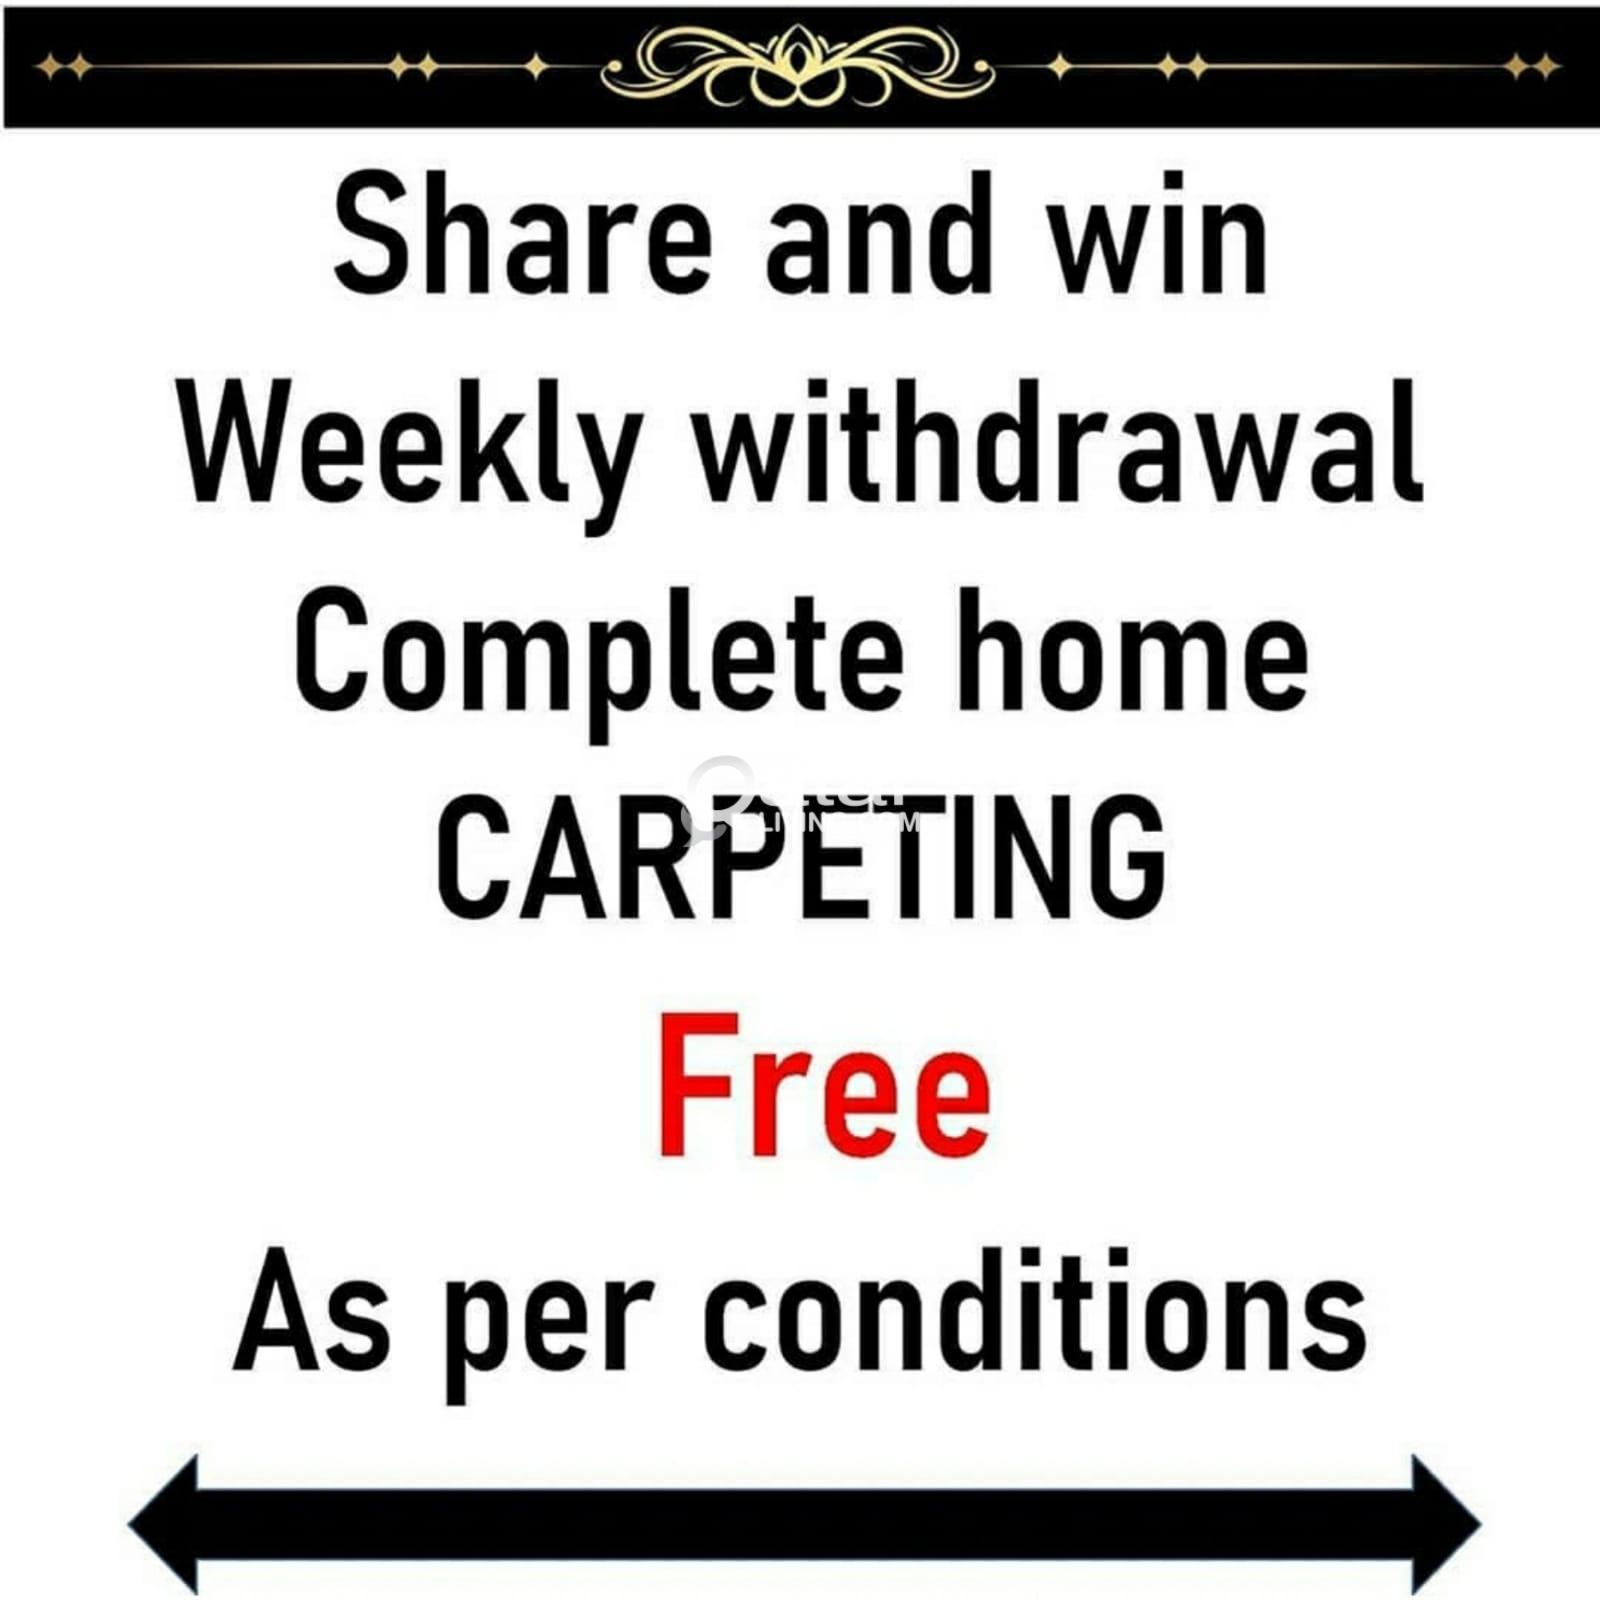 FREE RUGS,CARPET,CONTEST